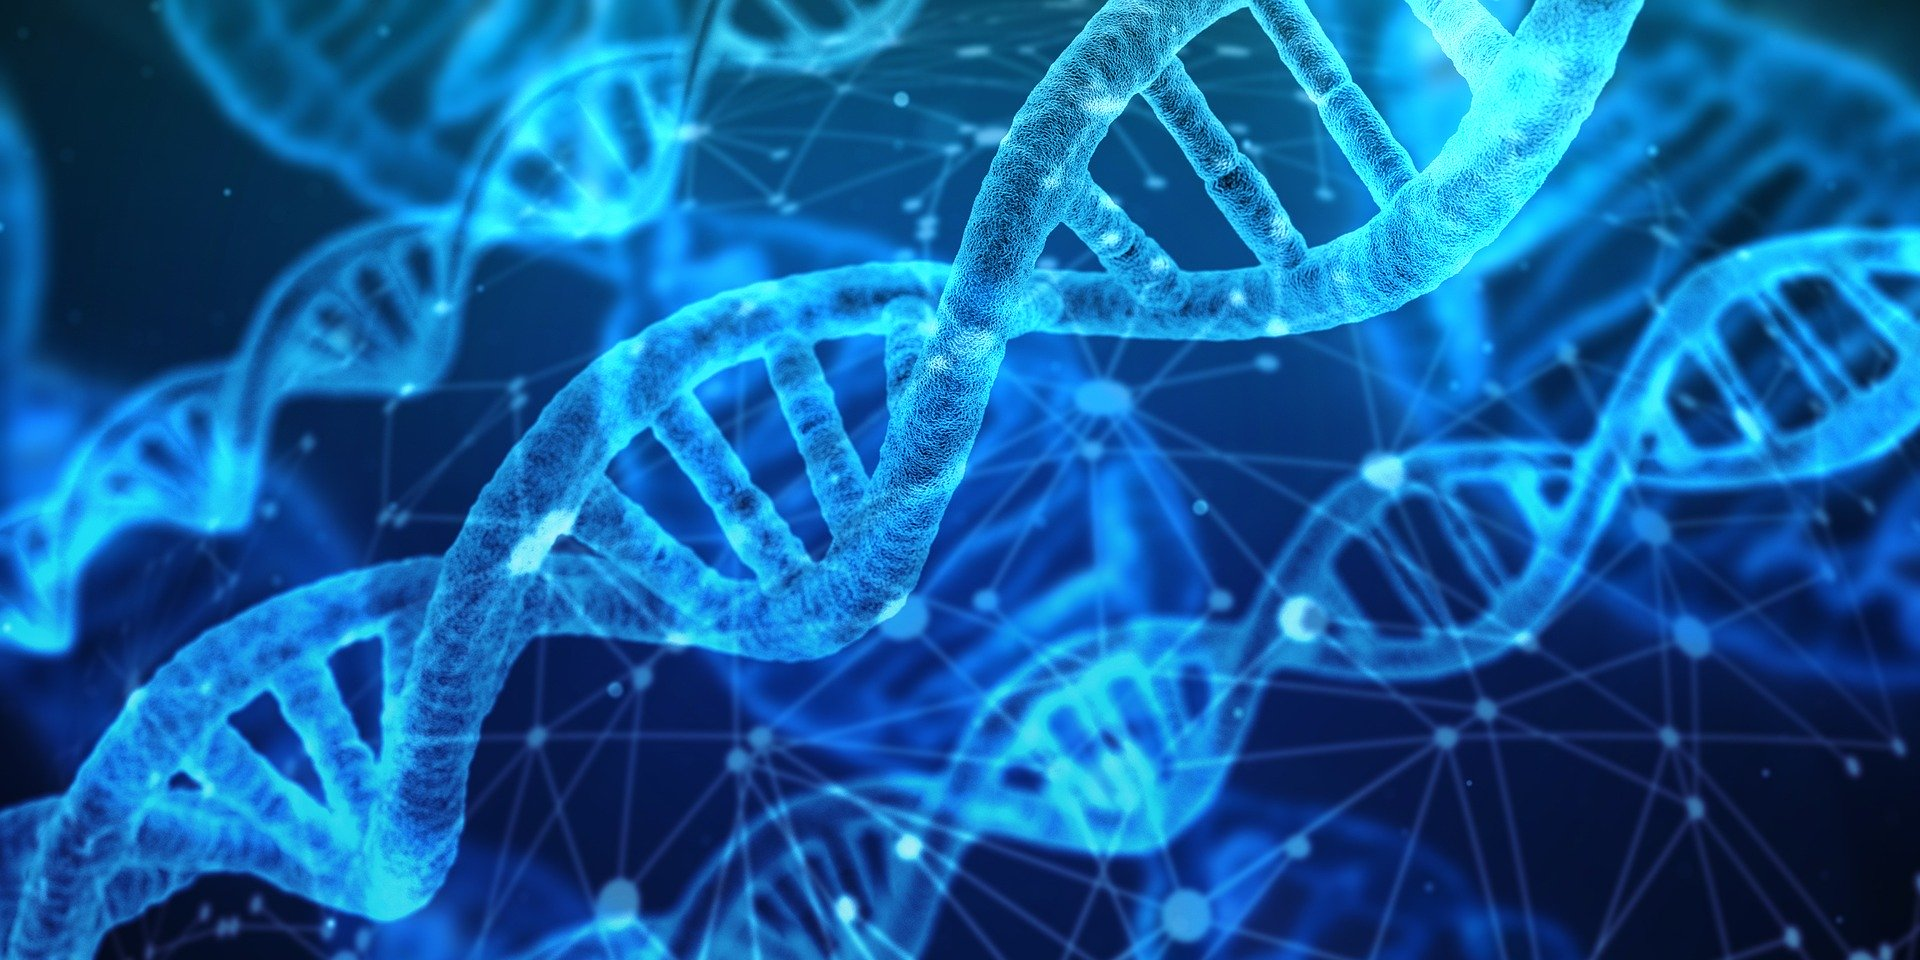 Molecular Biology image